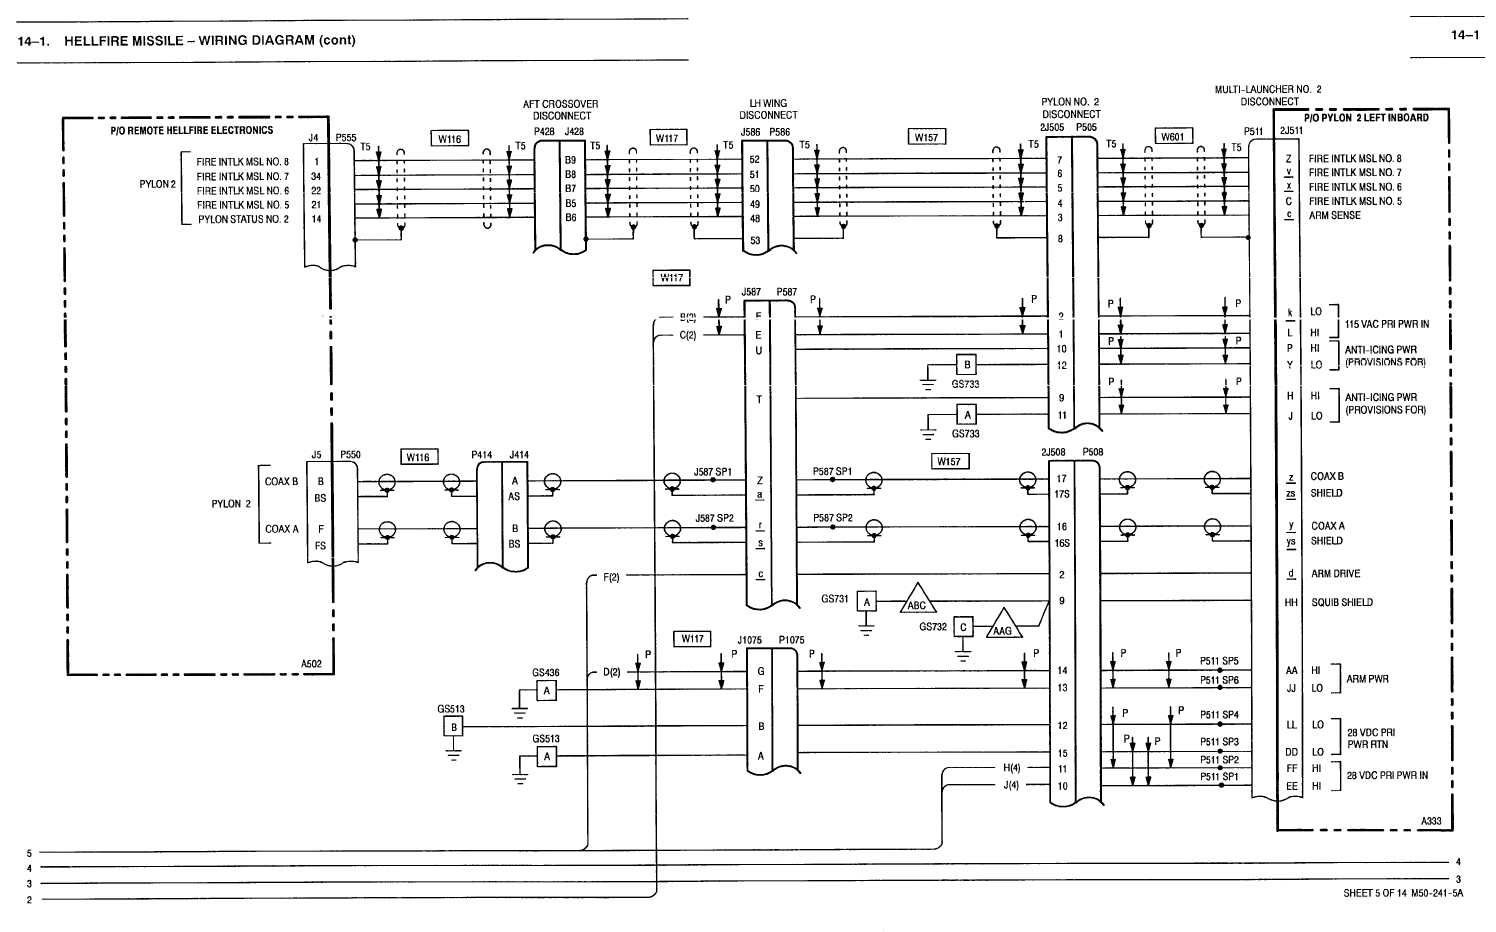 Pri Wiring Diagram Library 14 1 Tm 1520 238 T 10 6